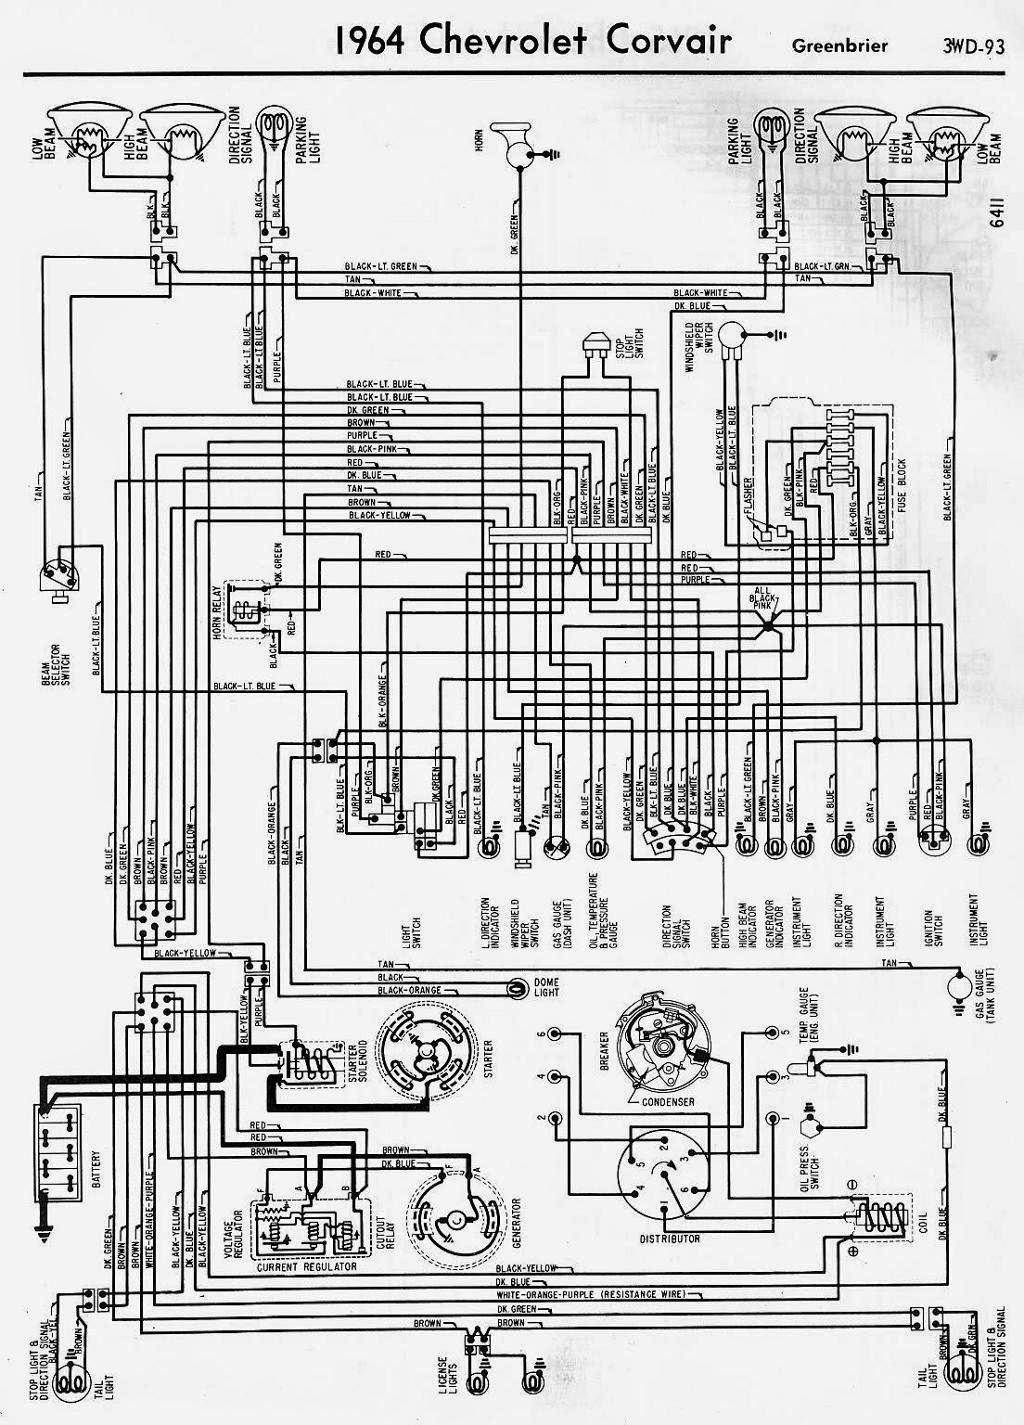 1966 Corvair Fuse Box | Wiring Diagrams on 1973 nova wiring diagram, 66 nova wiring diagram, 71 nova wiring diagram, 72 nova wiring diagram, 1975 nova wiring diagram, 1962 nova wiring diagram, 1964 nova wiring diagram, 1972 nova wiring diagram, 1963 nova air cleaner, 1965 nova wiring diagram, 70 nova wiring diagram, 1971 nova wiring diagram, 1967 nova wiring diagram, 1963 nova fuel gauge, chevy nova wiring diagram, 1969 nova wiring diagram, 1966 nova wiring diagram, 1968 nova wiring diagram, 1970 nova wiring diagram, 1974 nova wiring diagram,